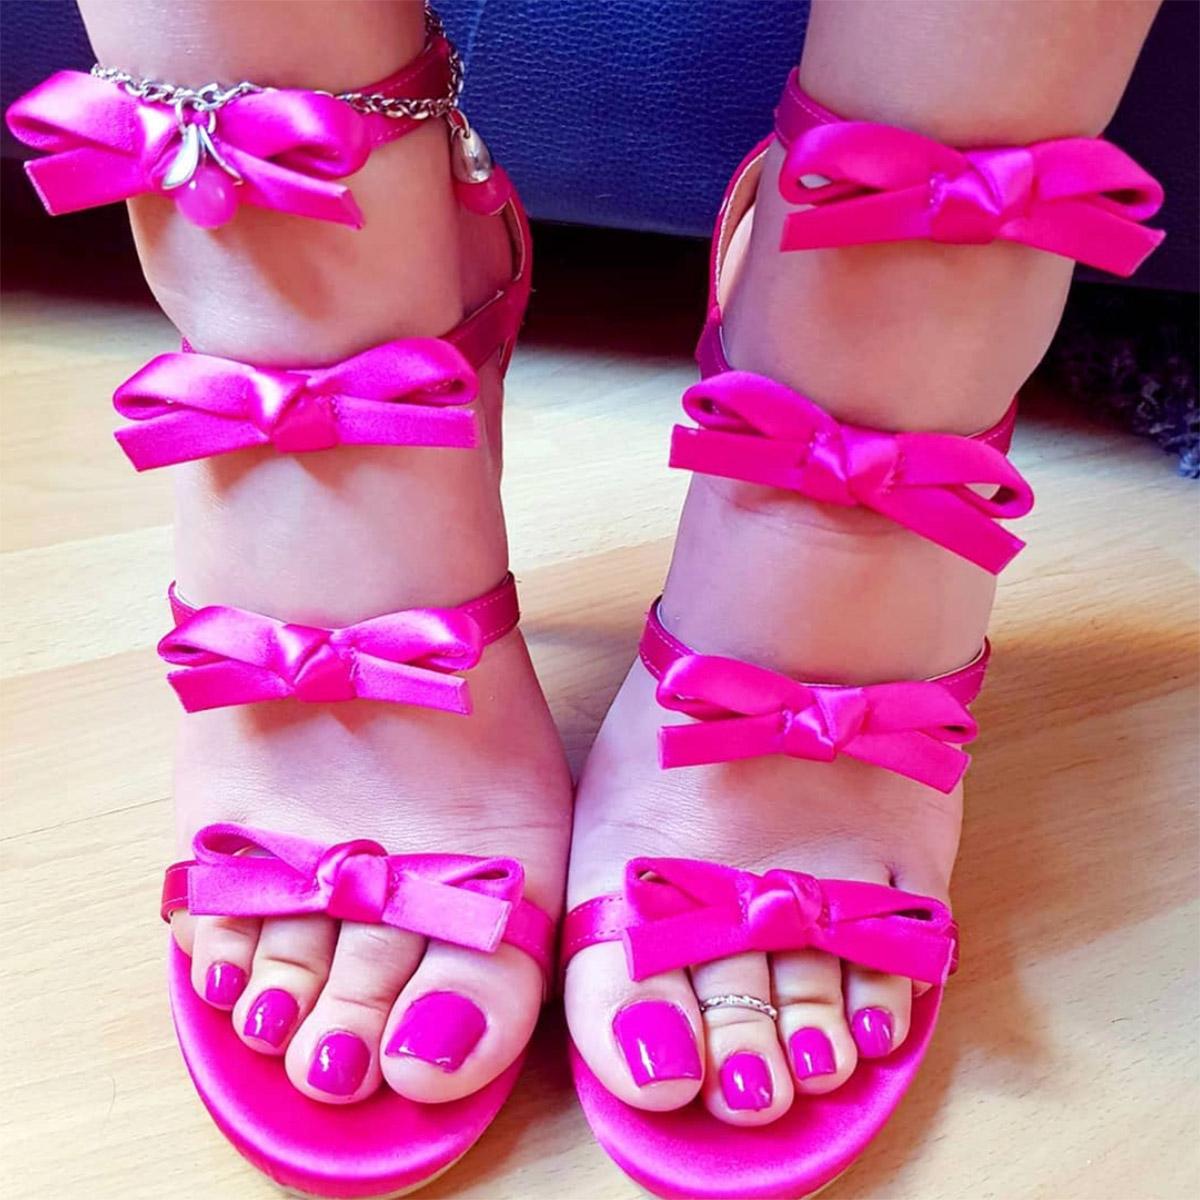 Gorgeous German Feet - Social Media Feet